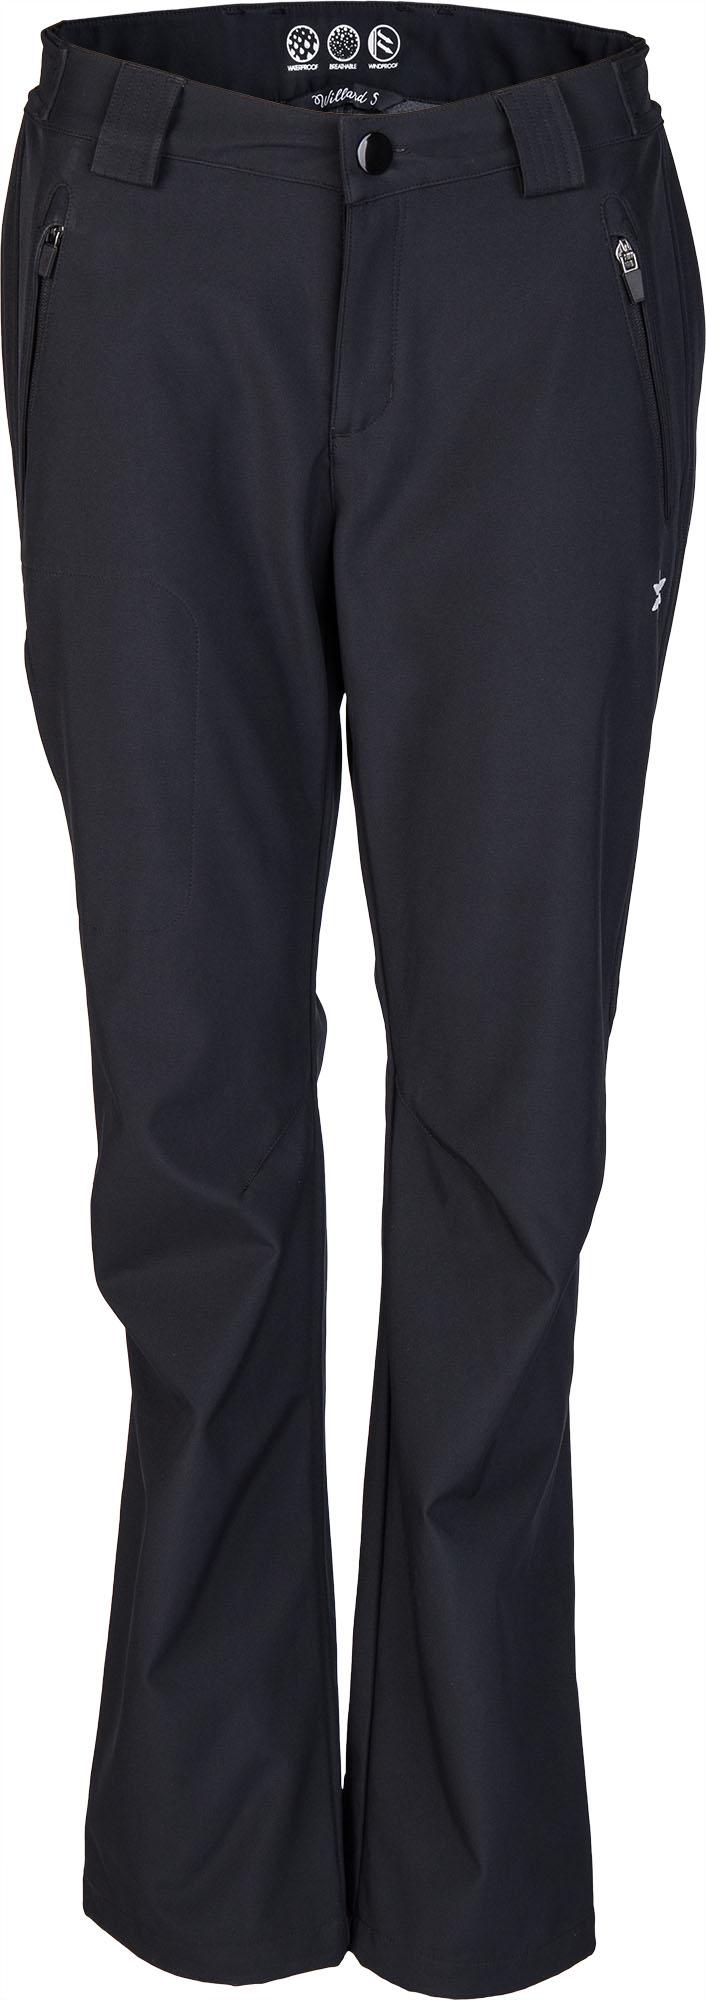 0c25c97ee47 Willard RONIA. Dámské softshellové kalhoty ...